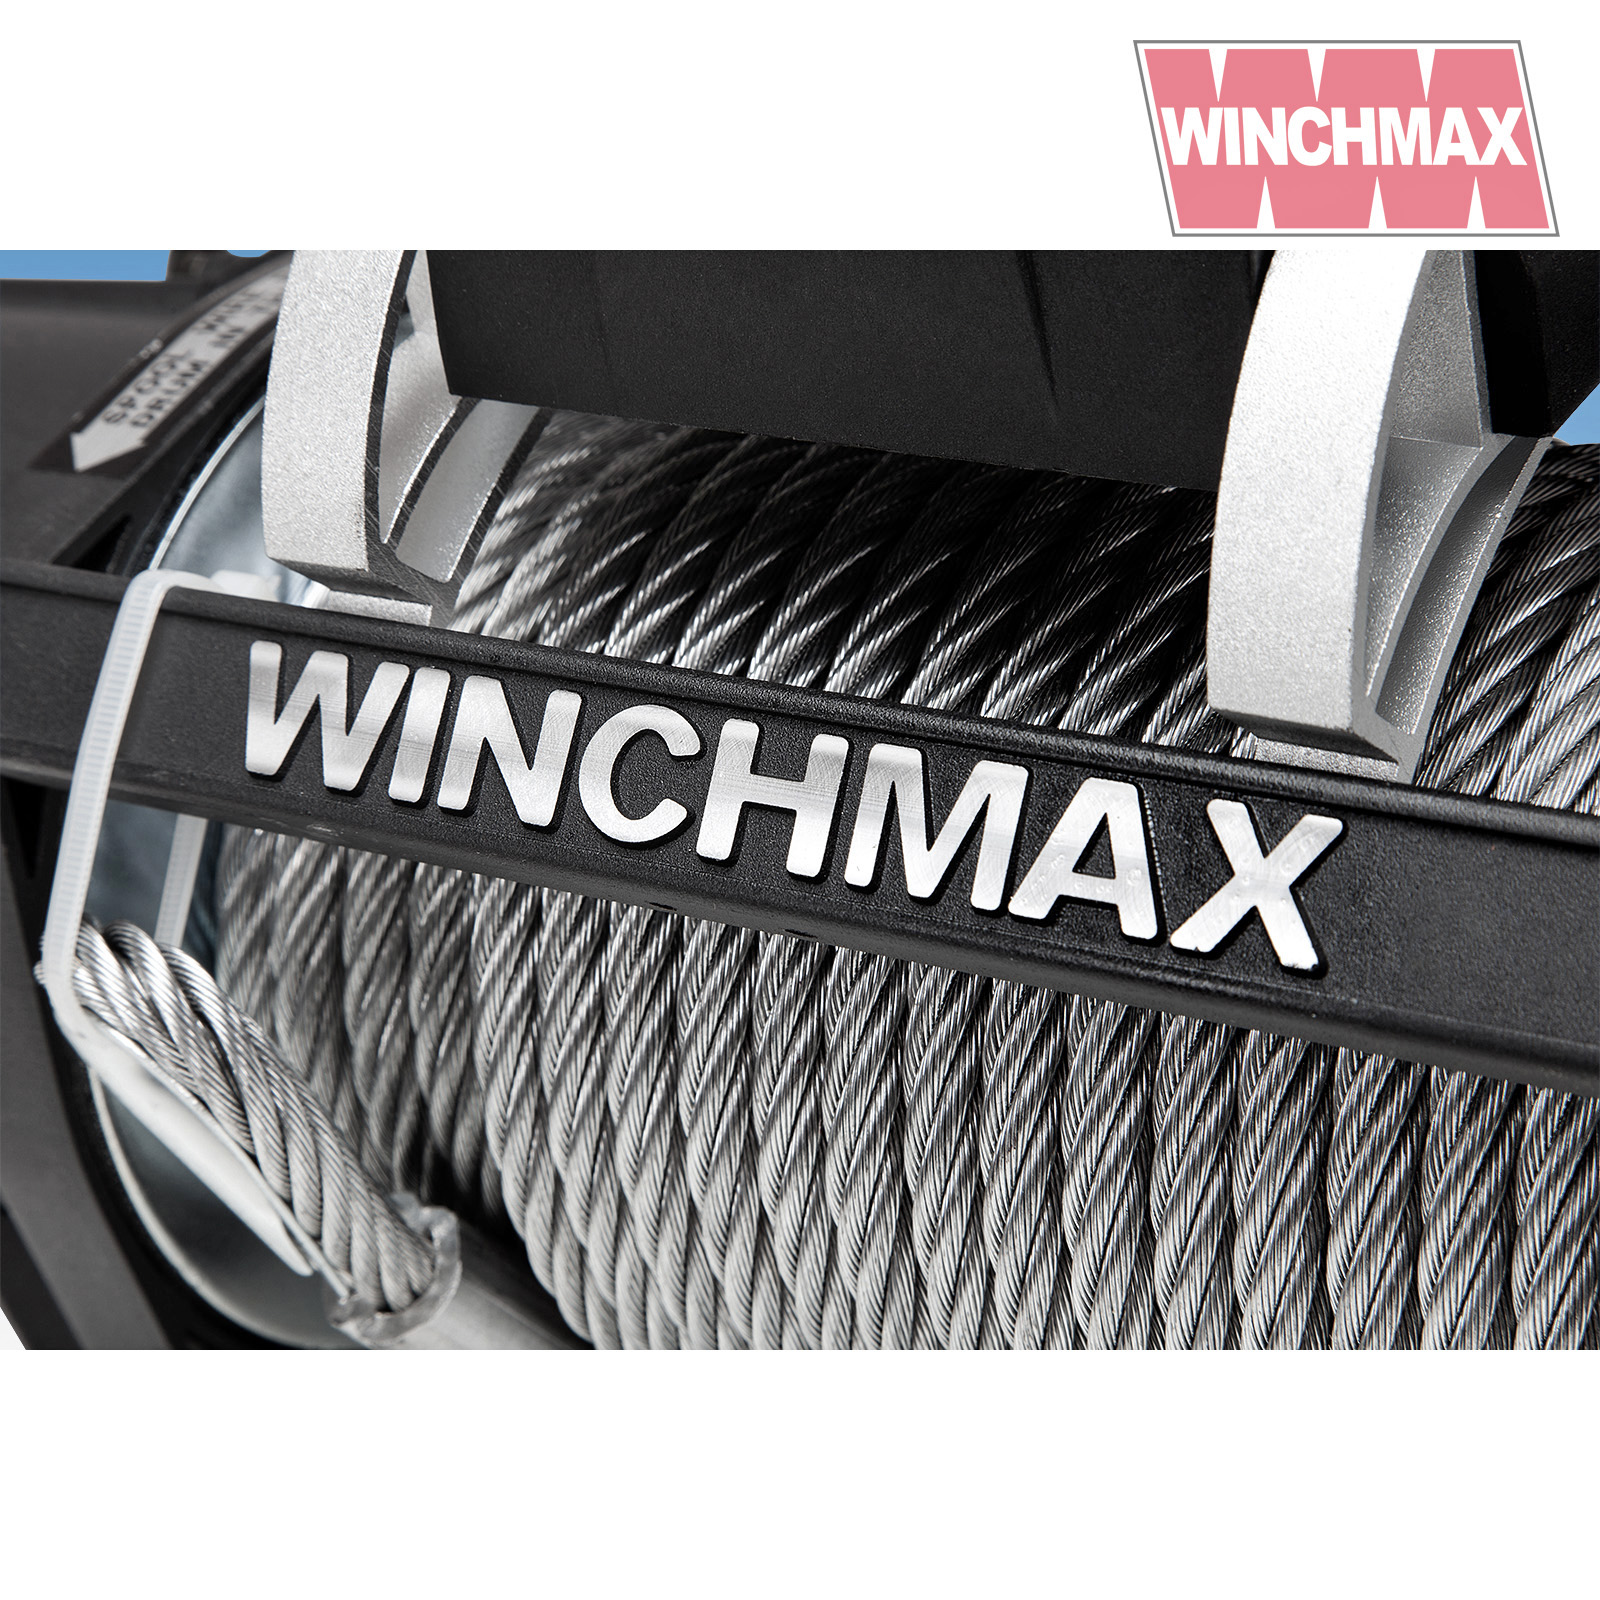 Wmsl1350012vmilspec winchmax 149